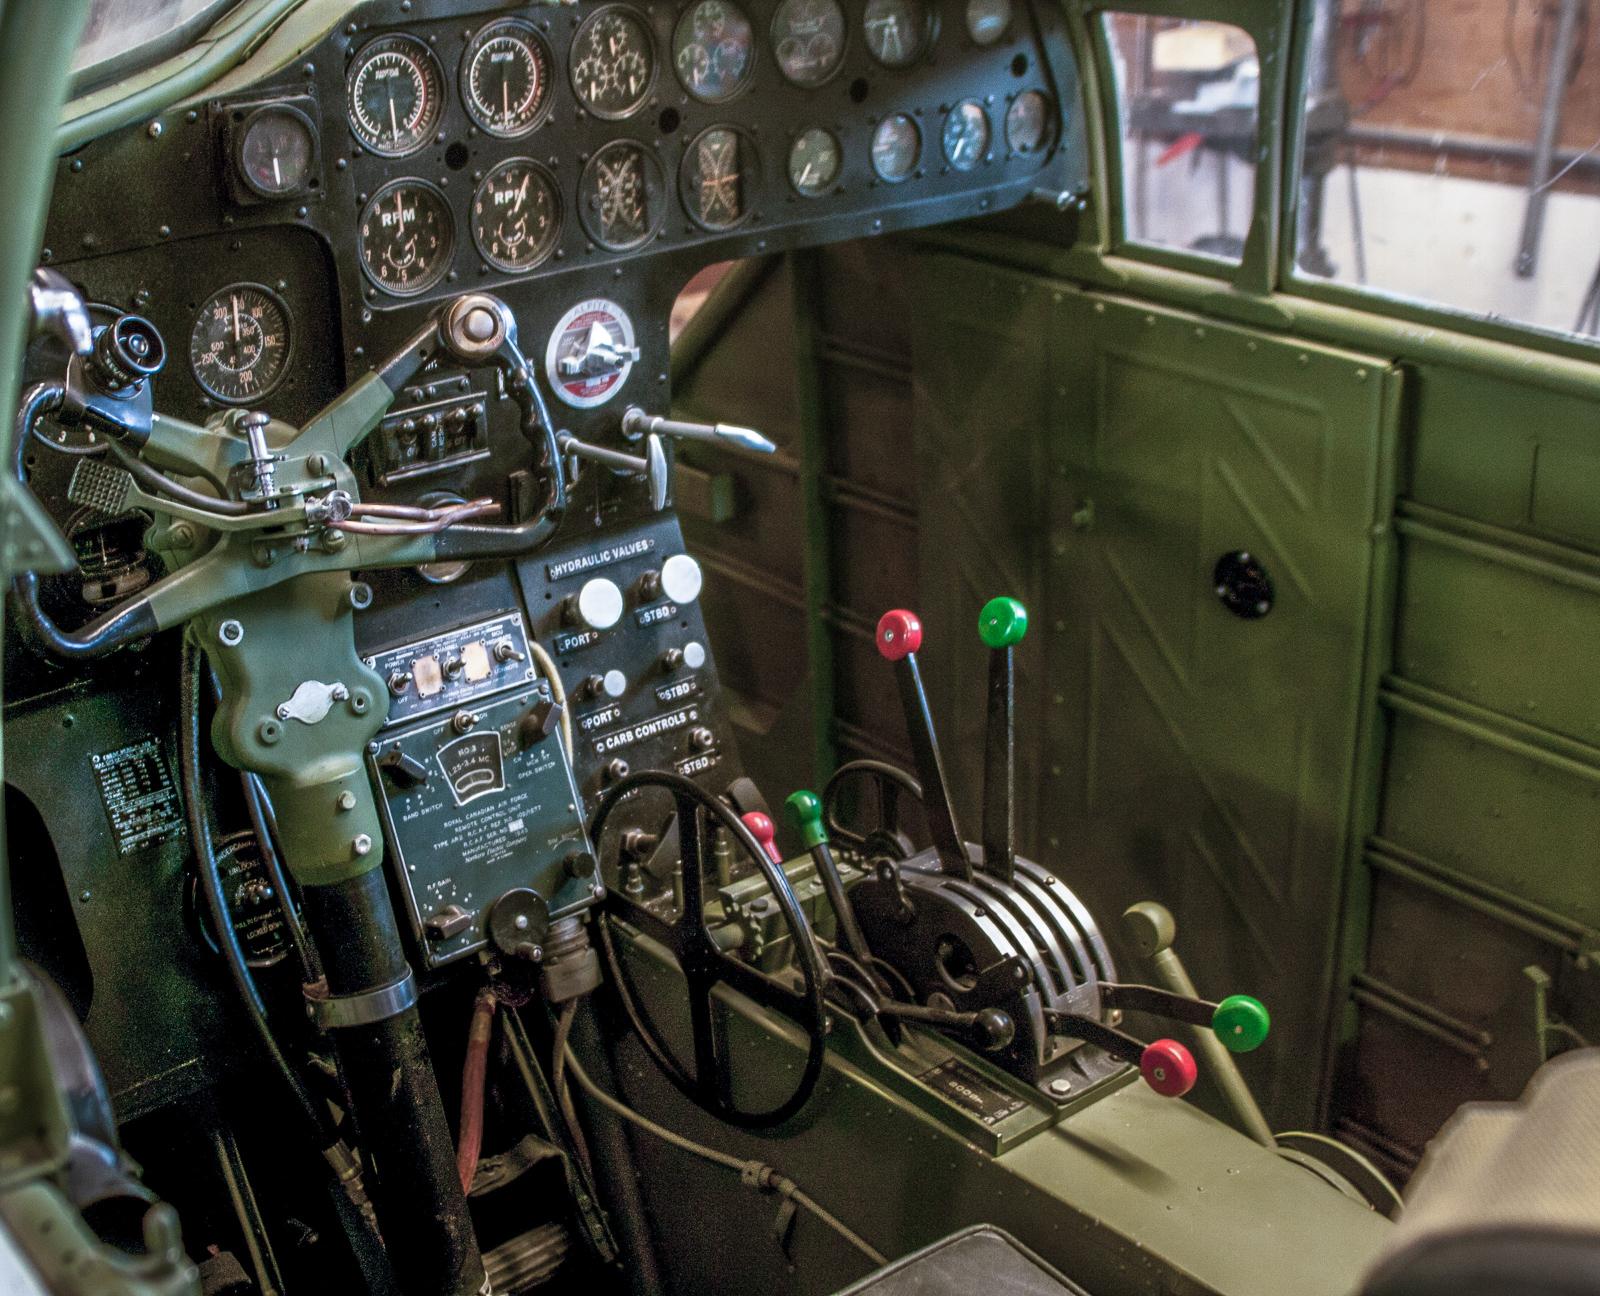 The Bolingbroke's cockpit. (photo via Benoit deMulder)